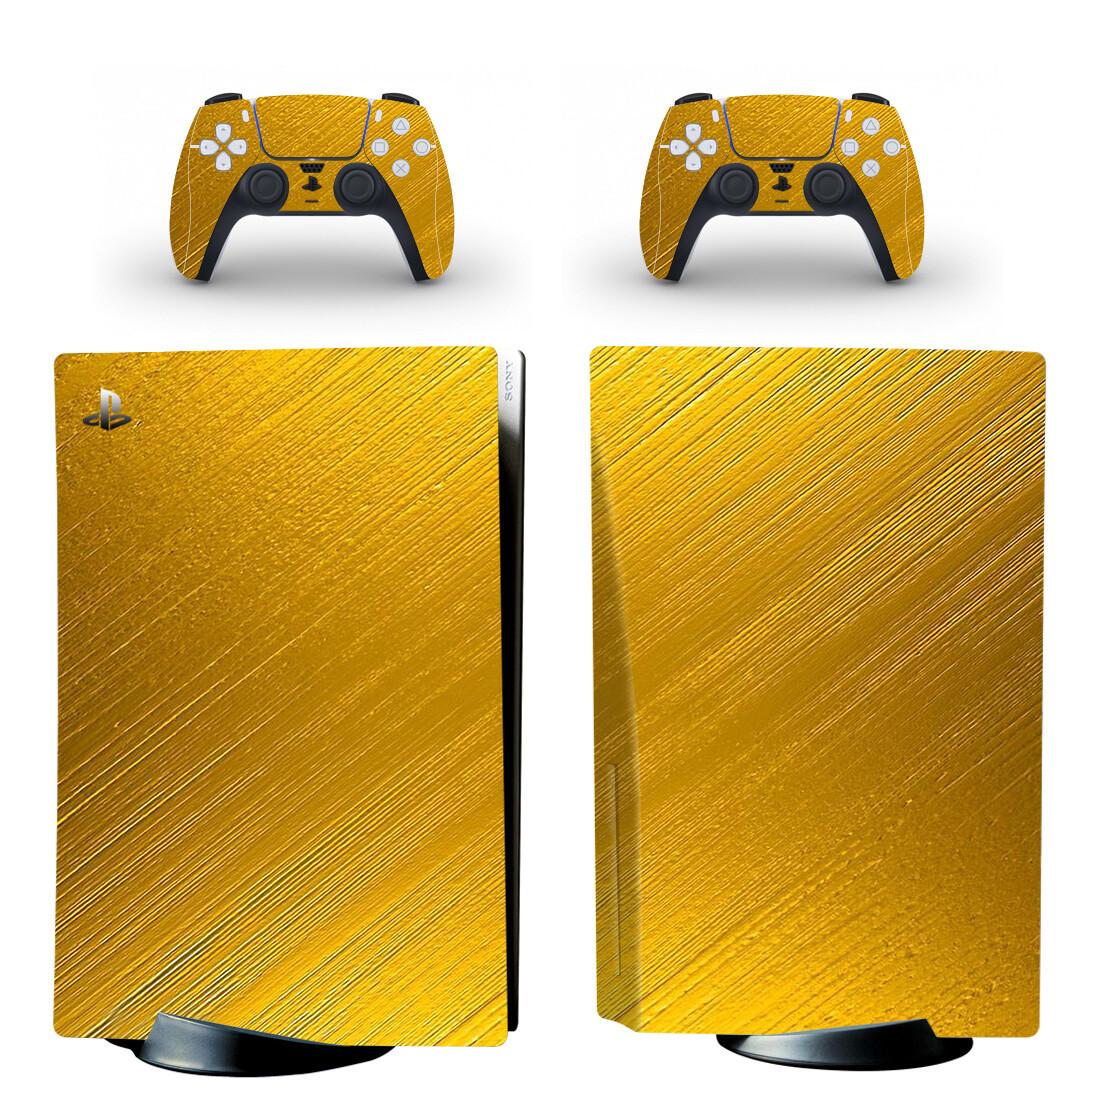 Golden Gradient Skin Sticker Decal For PlayStation 5